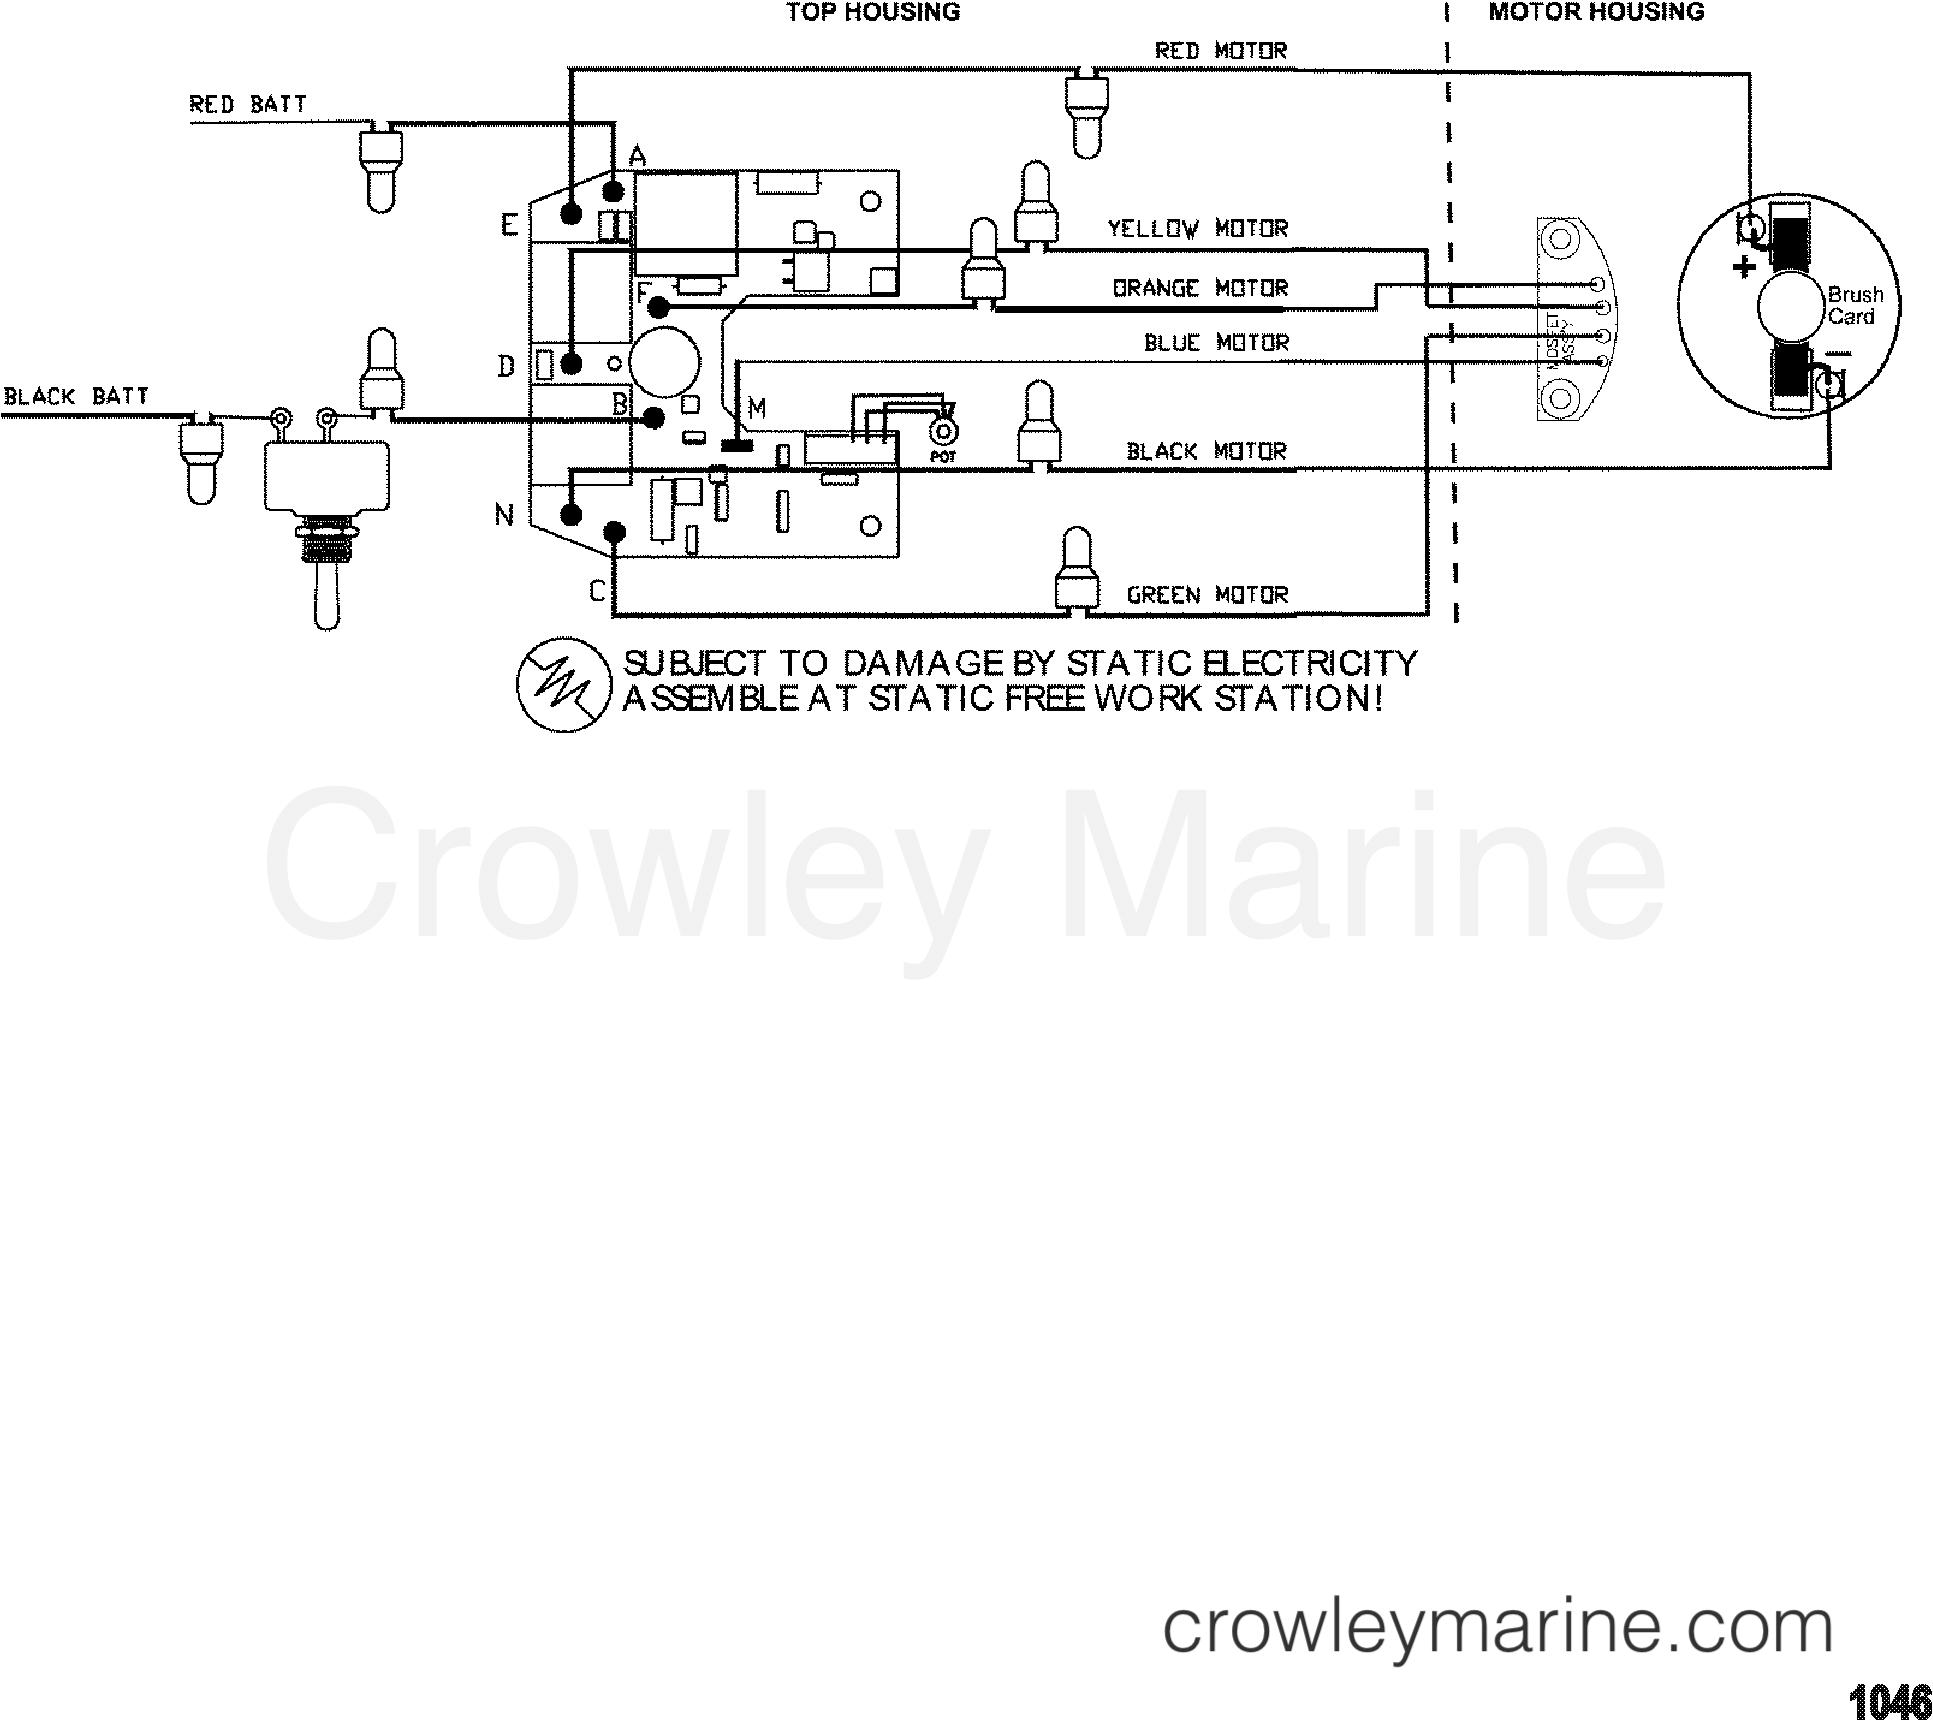 1999 MotorGuide 12V [MOTORGUIDE] - 9GW3637VU WIRE DIAGRAM(MODEL GWB107V / GWT107V) section